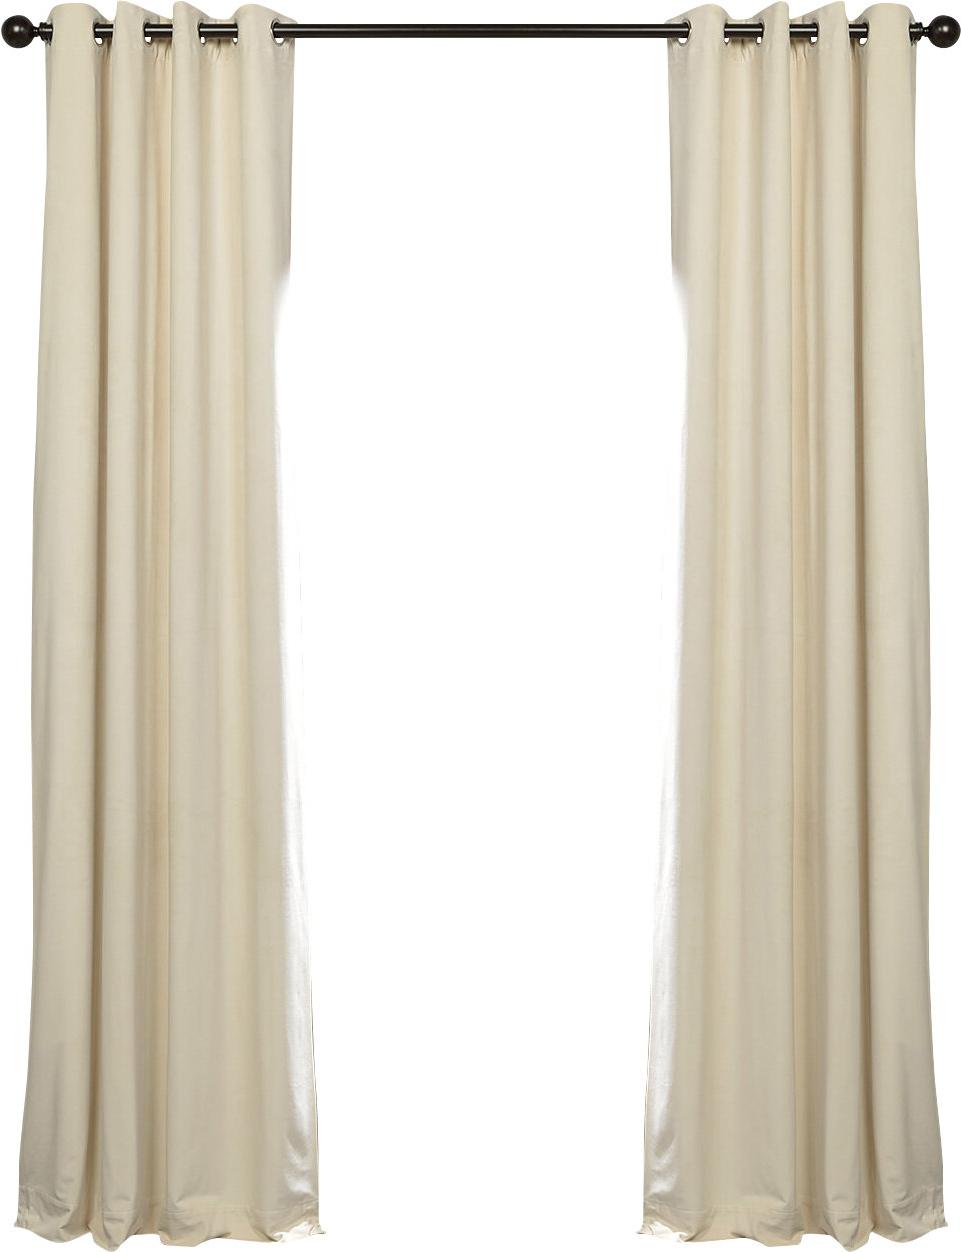 Most Recently Released Sharpe Solid Velvet Blackout Grommet Single Curtain Panel Inside Heritage Plush Velvet Single Curtain Panels (View 20 of 20)